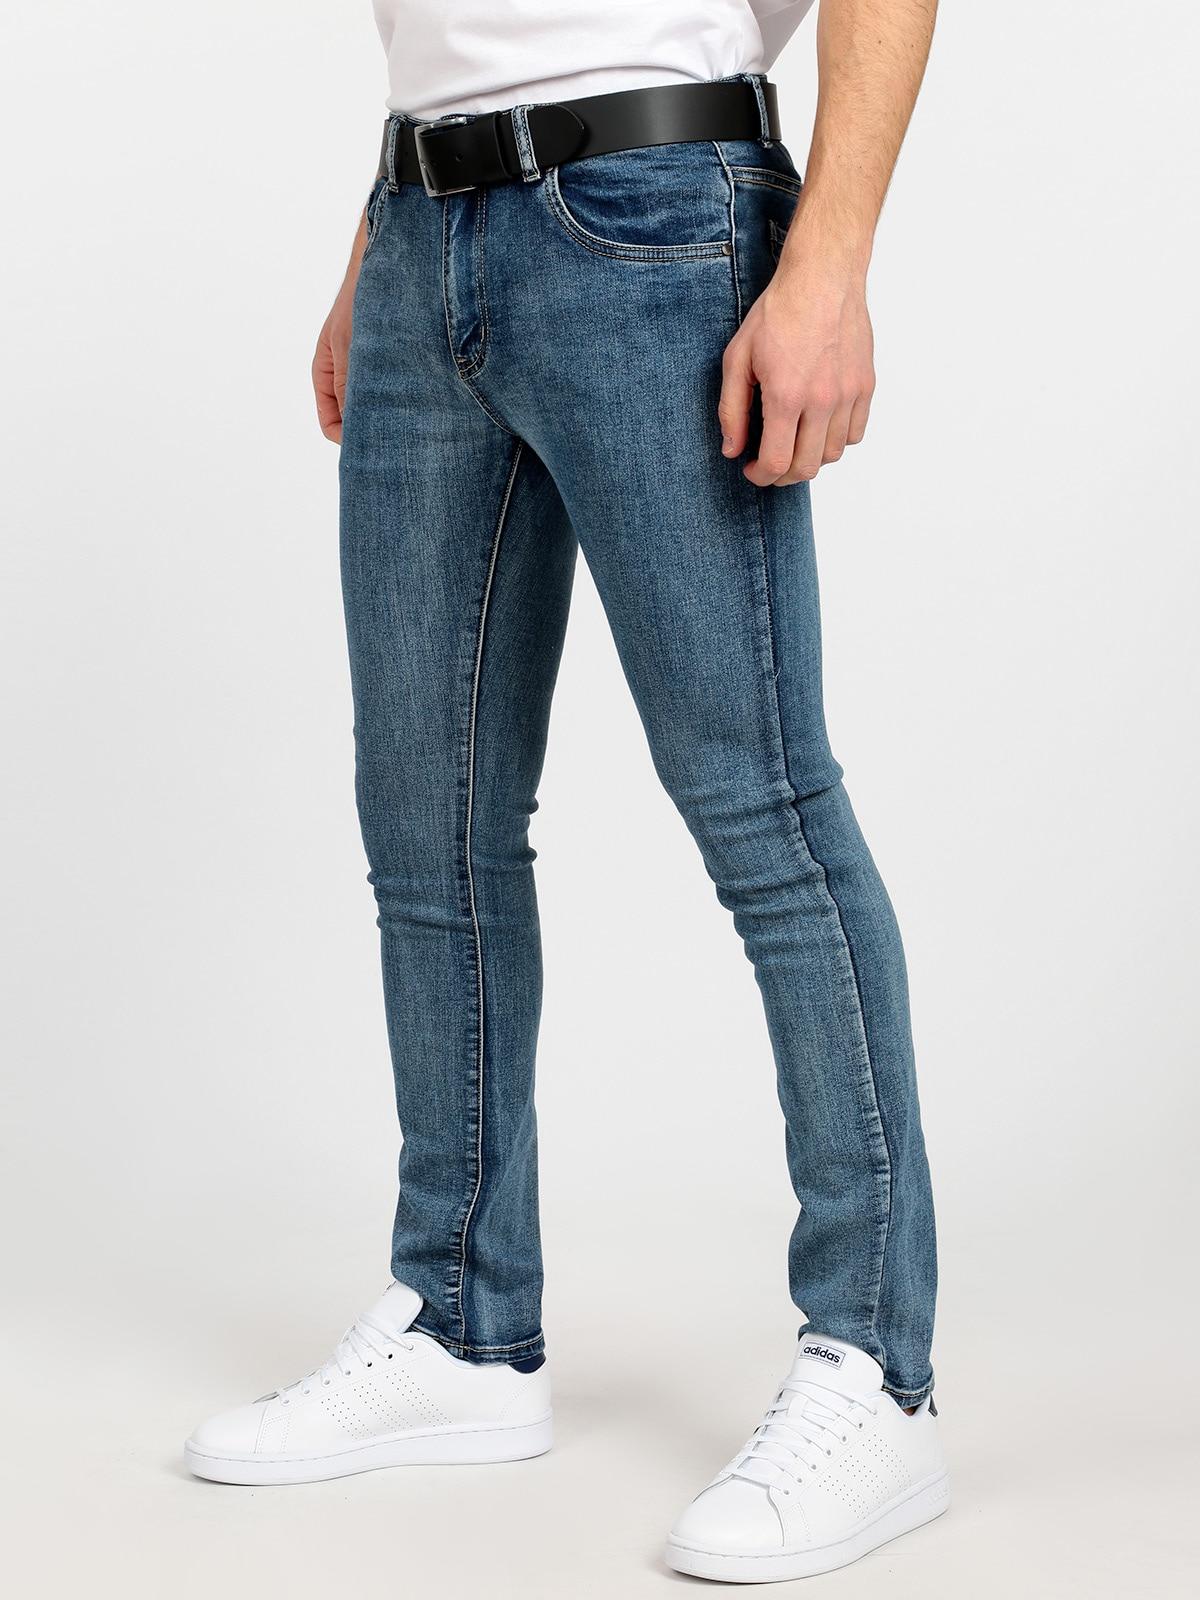 SAILING SHIP Jeans Stretch Cotton